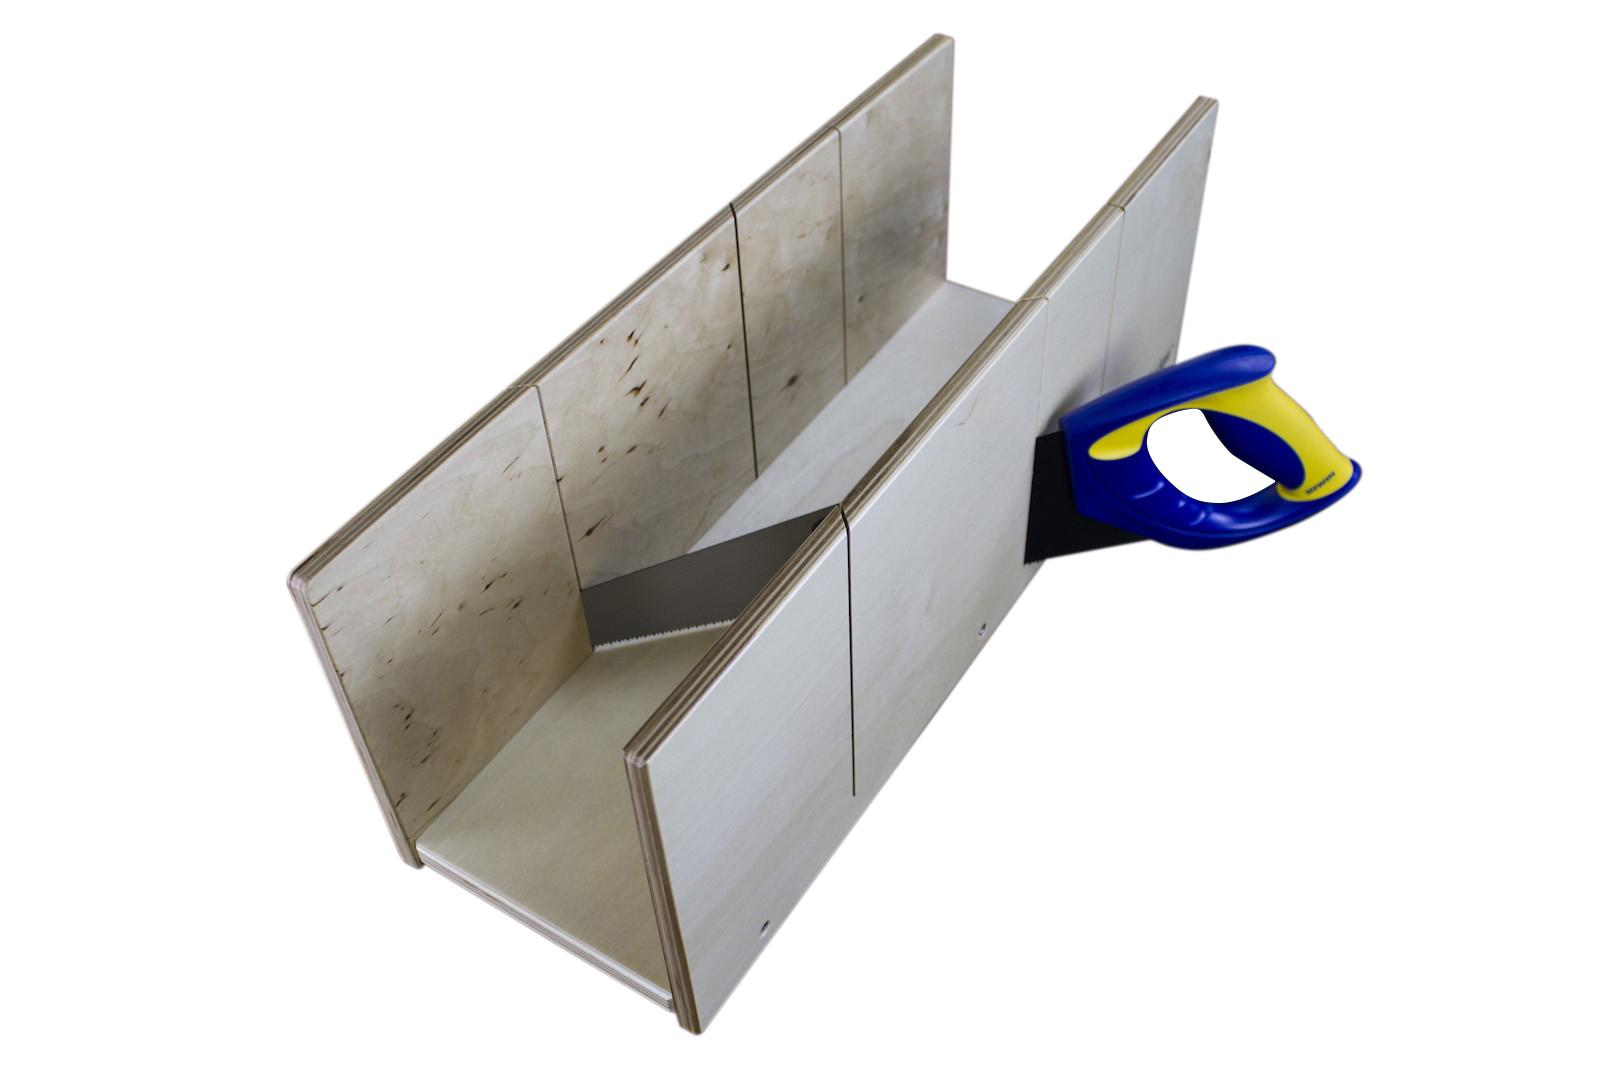 Gehrungslade | IRWIN-Säge | Holz | perfekte Winkel | Marbet | 19x49cm